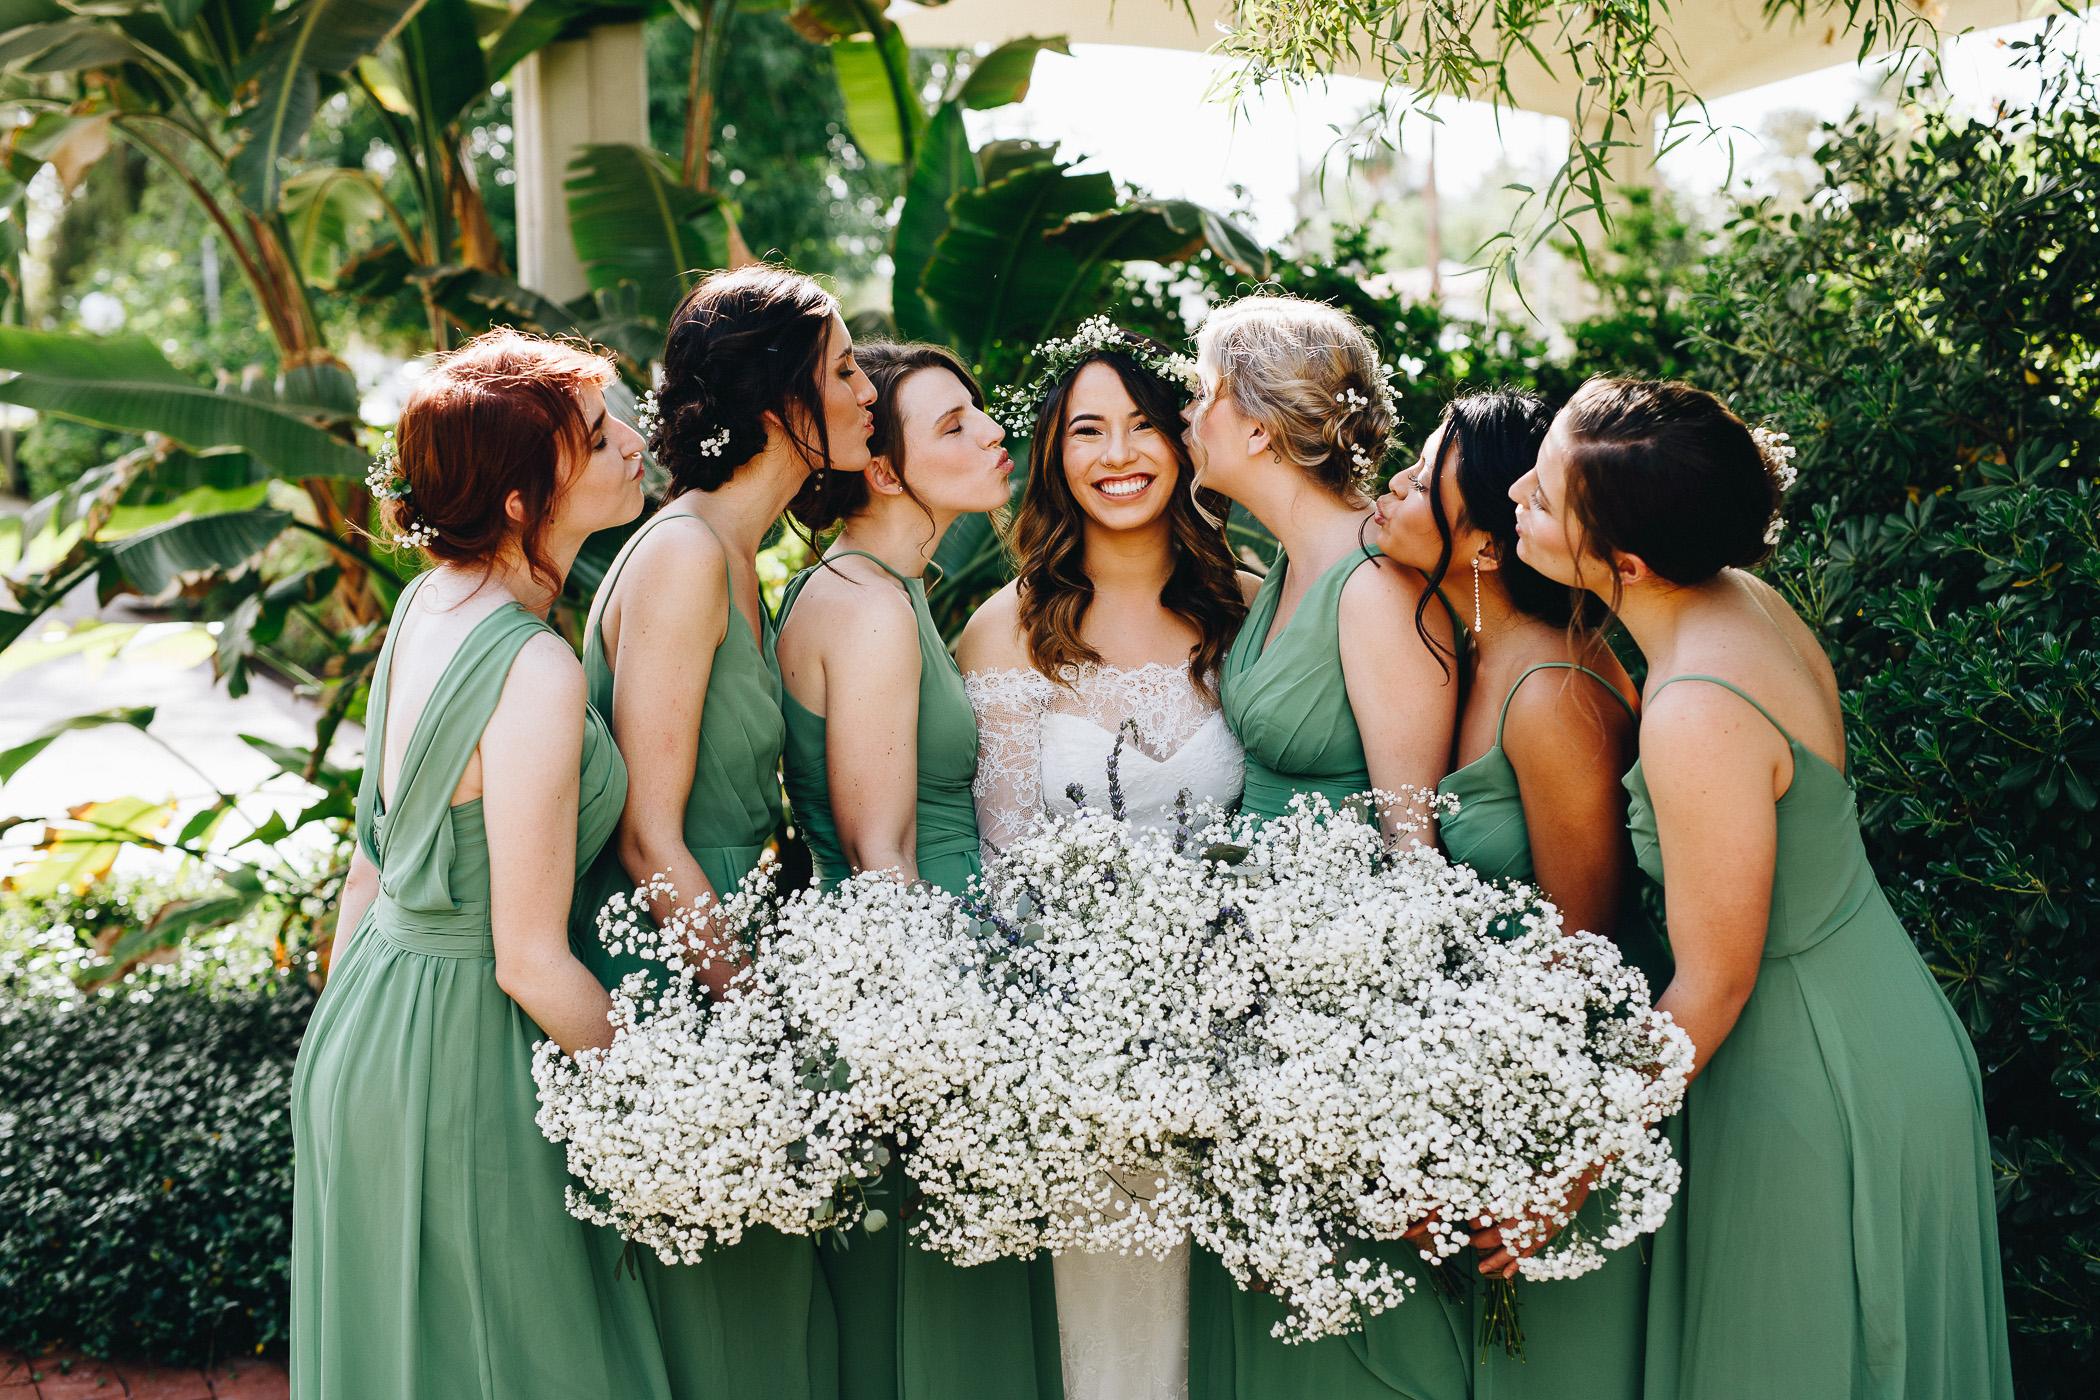 181104-Luxium-Weddings-Arizona-@matt__Le-Brandon-Kariana-Phoenix-Valley-Garden-Center-1020.jpg